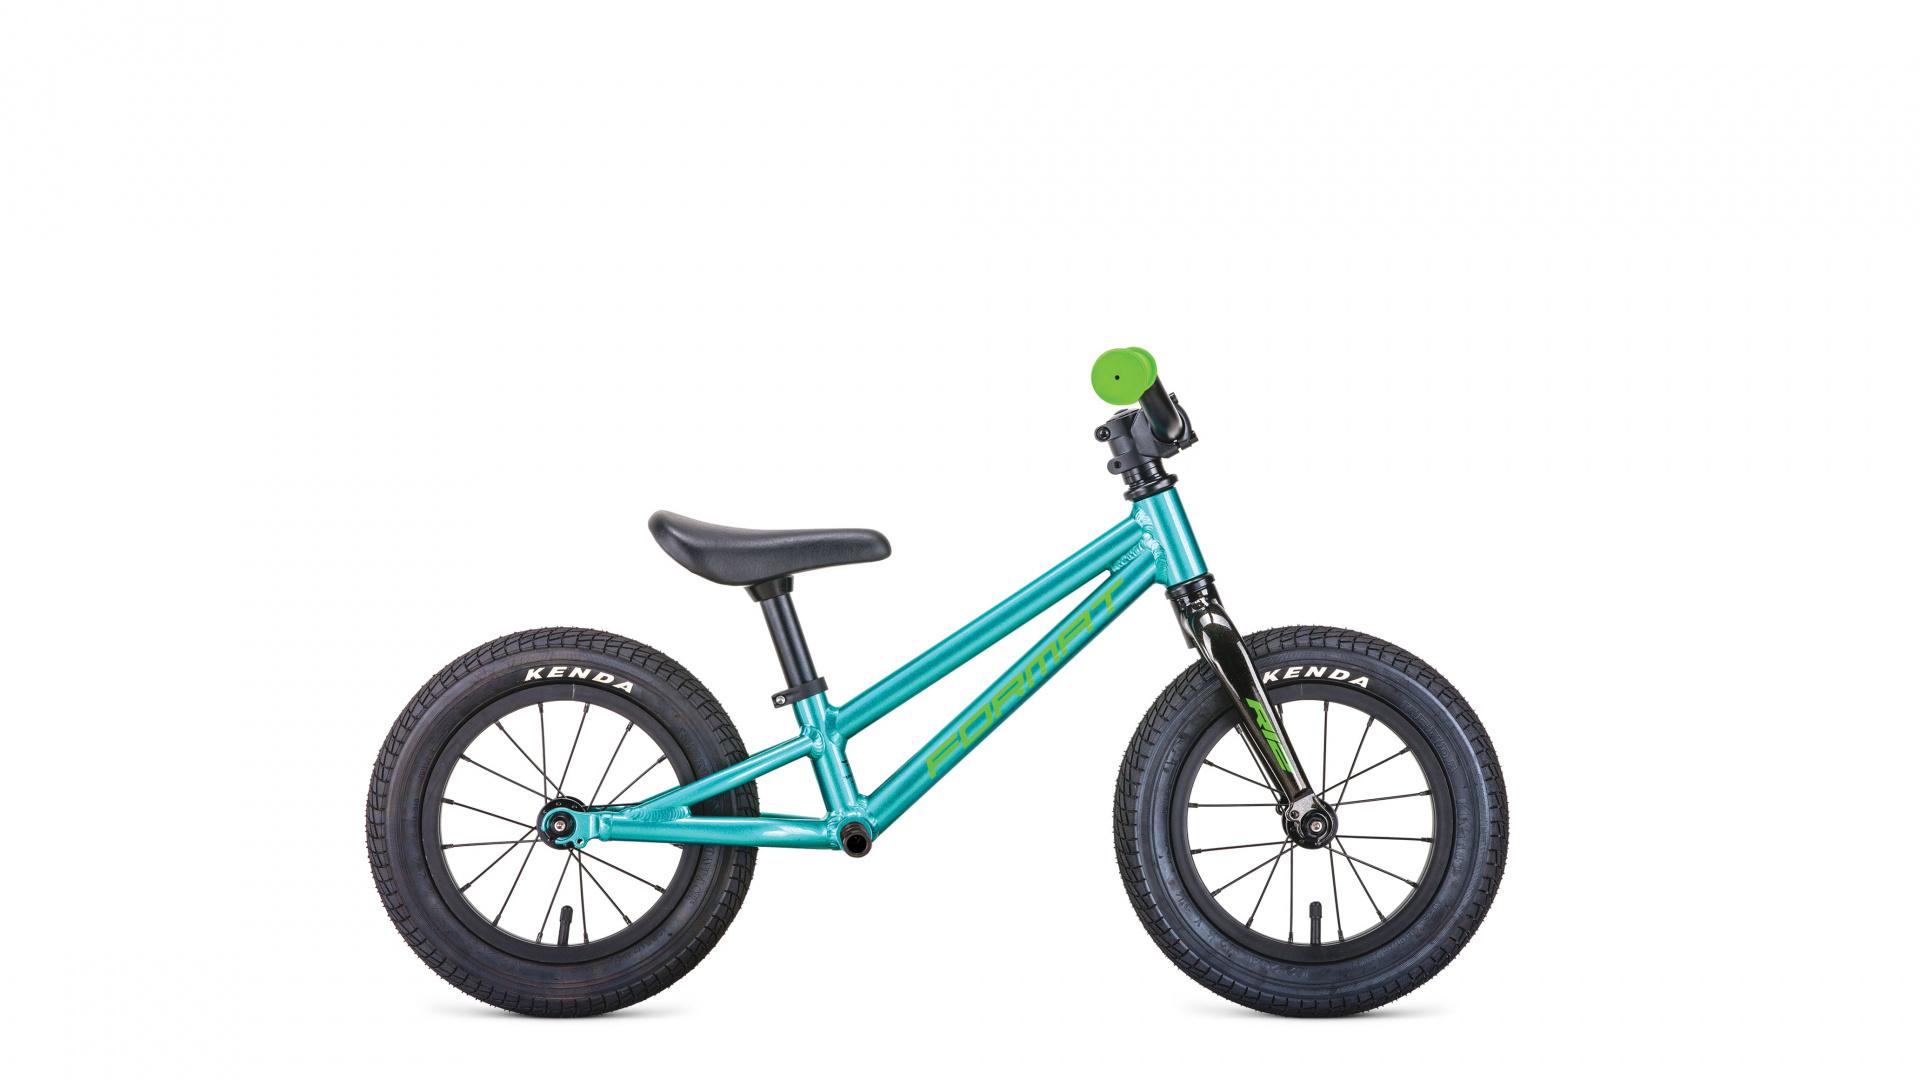 Runbike (рост OS) 2019-2020, зеленый, RBKM0H6EX001